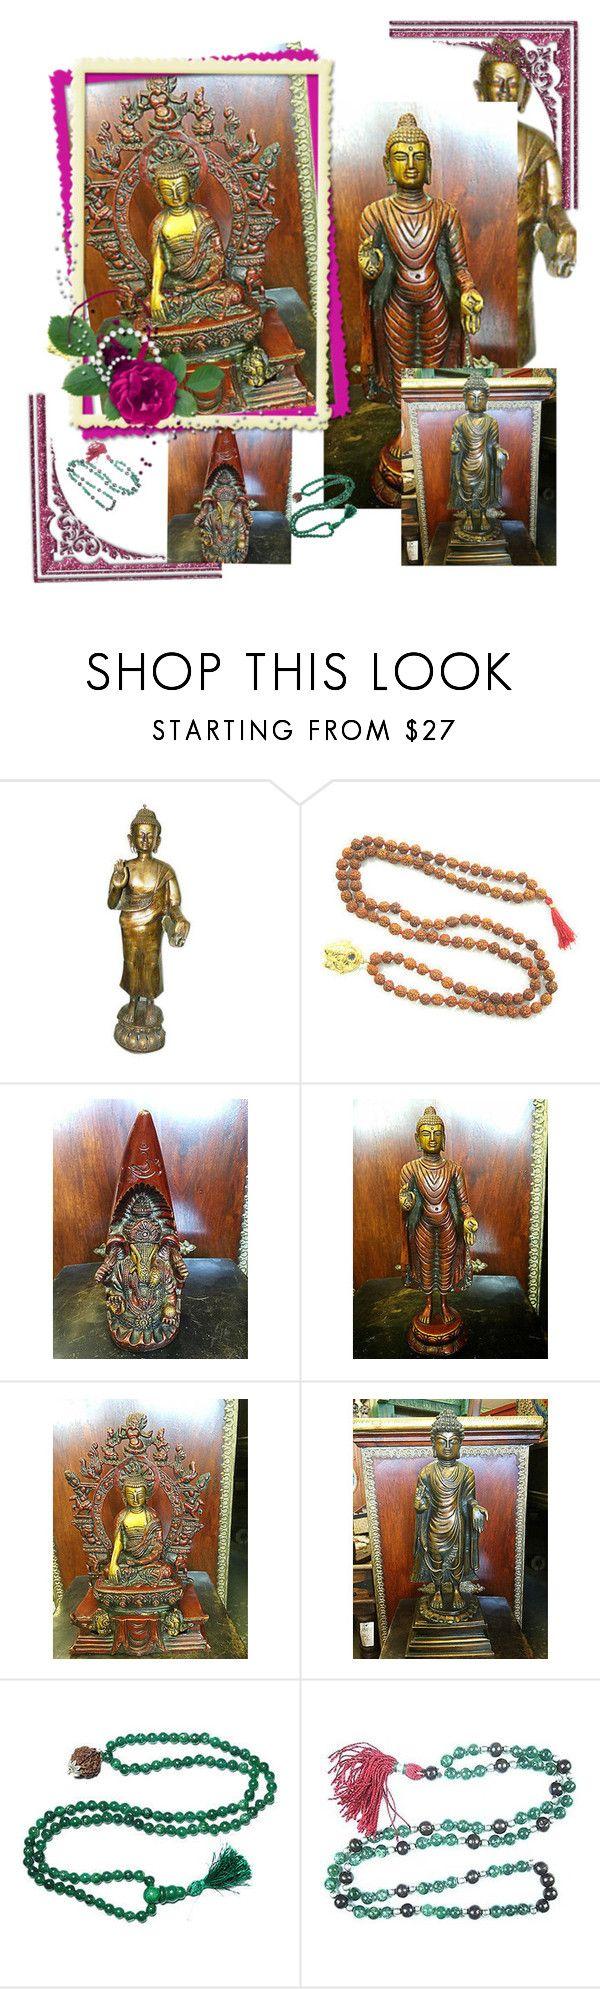 Zen Decor by baydeals on Polyvore featuring interior, interiors, interior design, home, home decor, interior decorating, statue, zendecor, brassstatue and buddhastatue   http://stores.ebay.com/mogulgallery/BRASS-STATUES-/_i.html?_fsub=353416319&_sid=3781319&_trksid=p4634.c0.m322